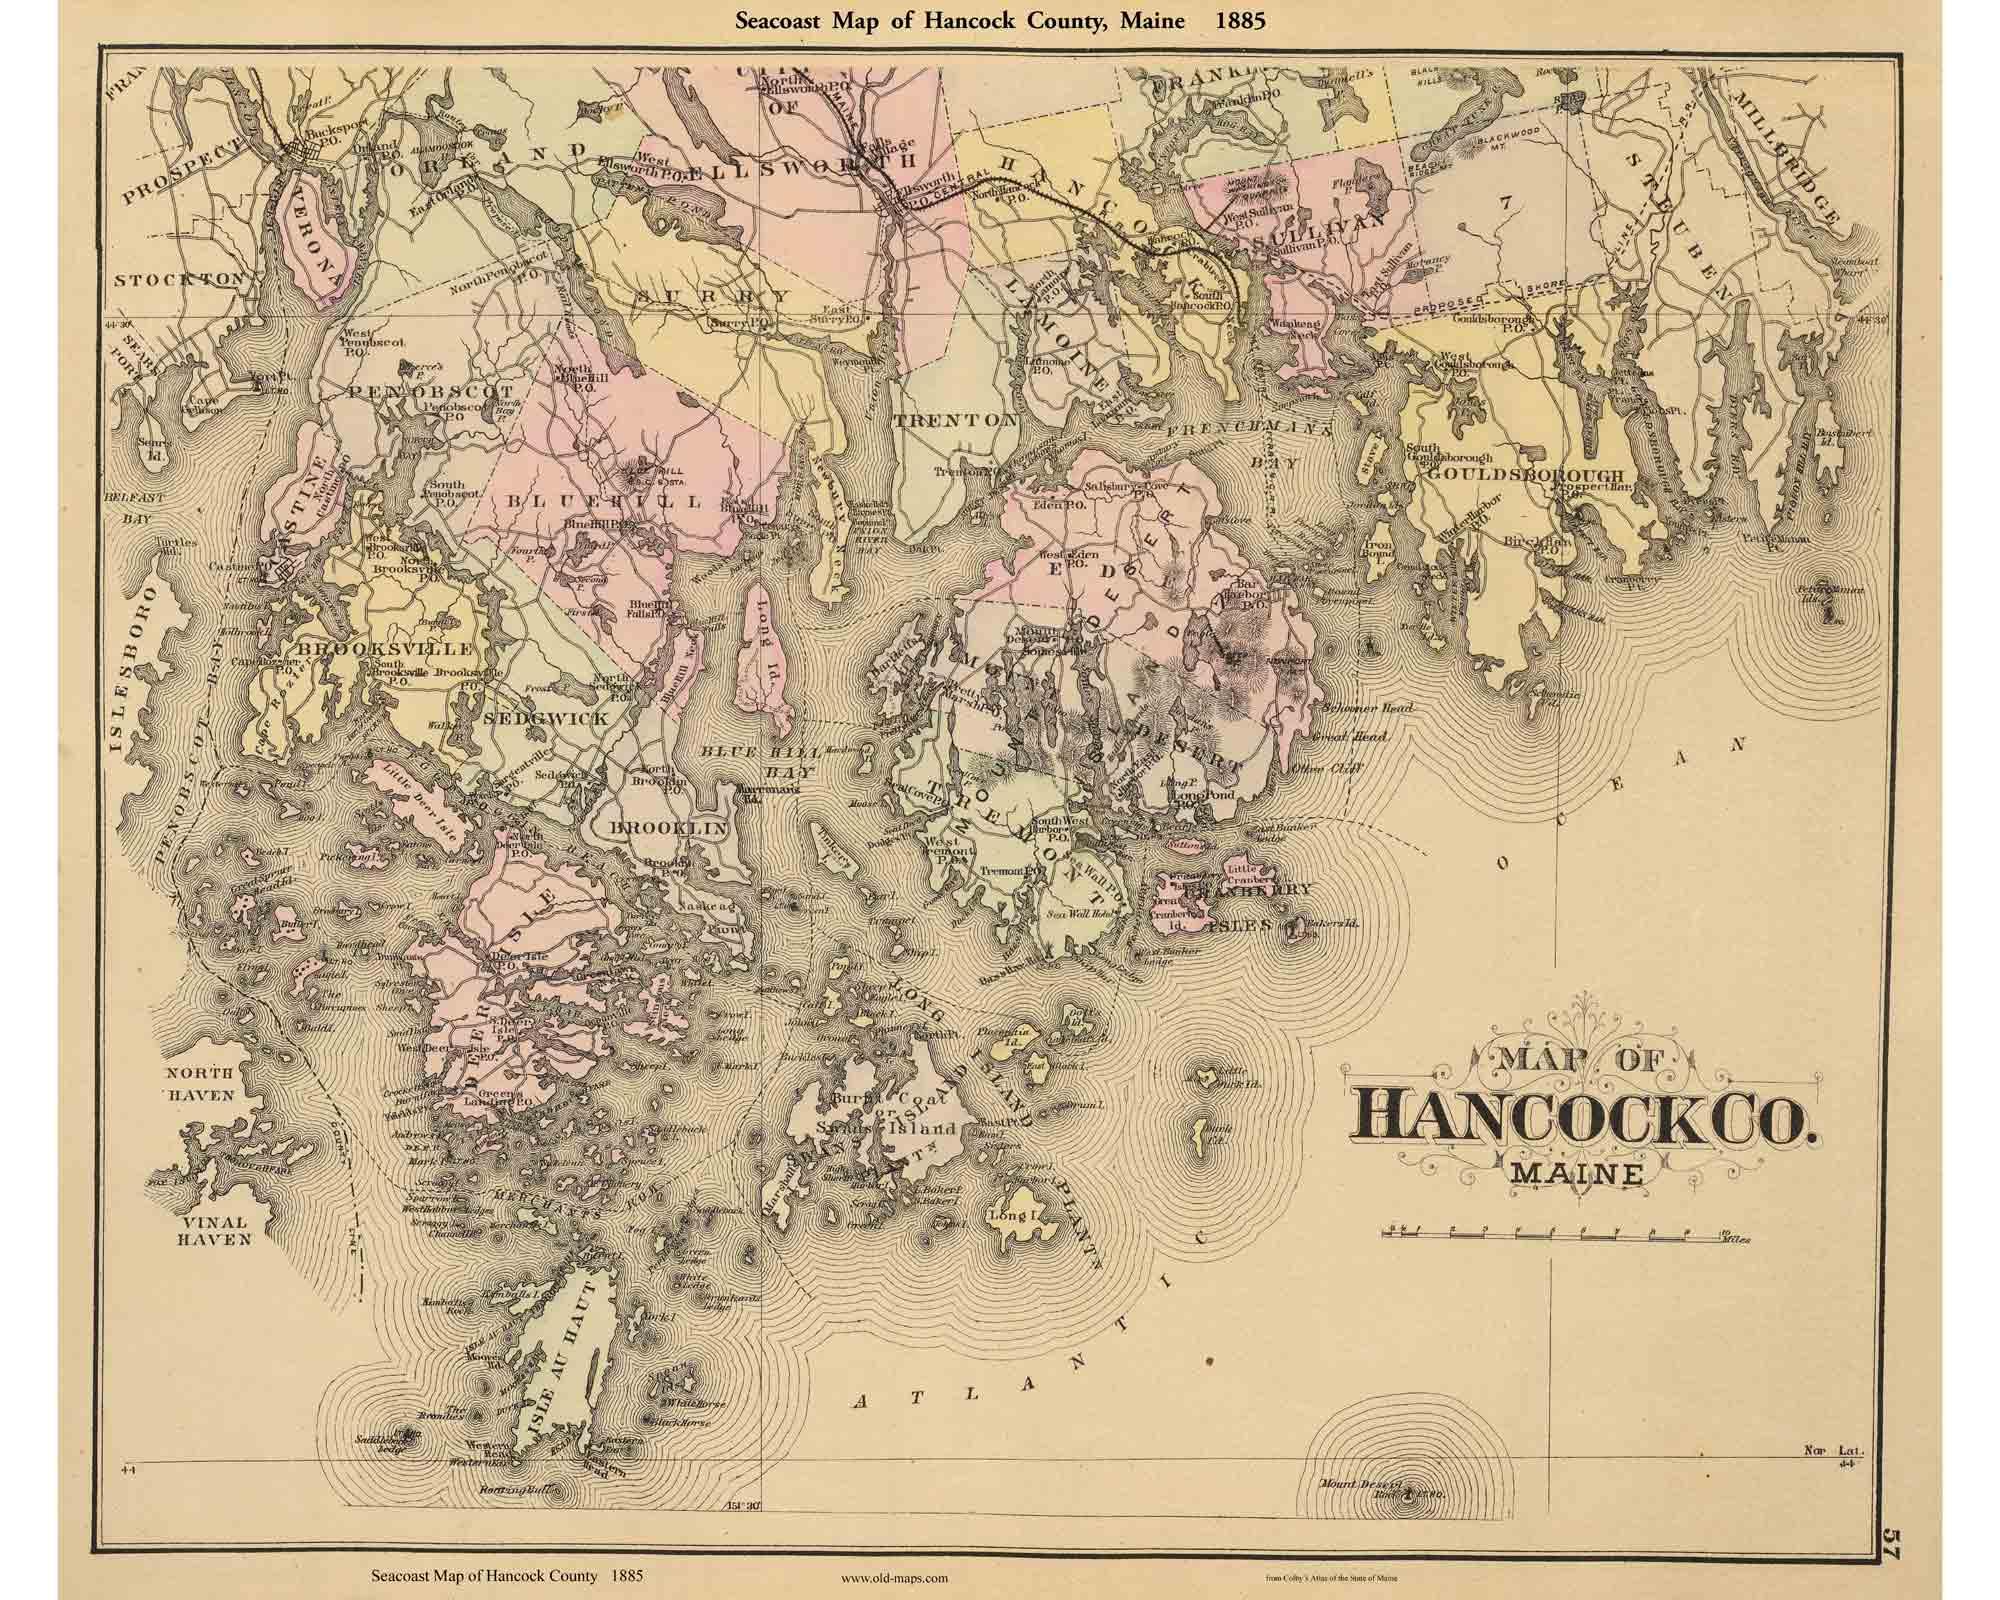 Hancock County 1885 Map